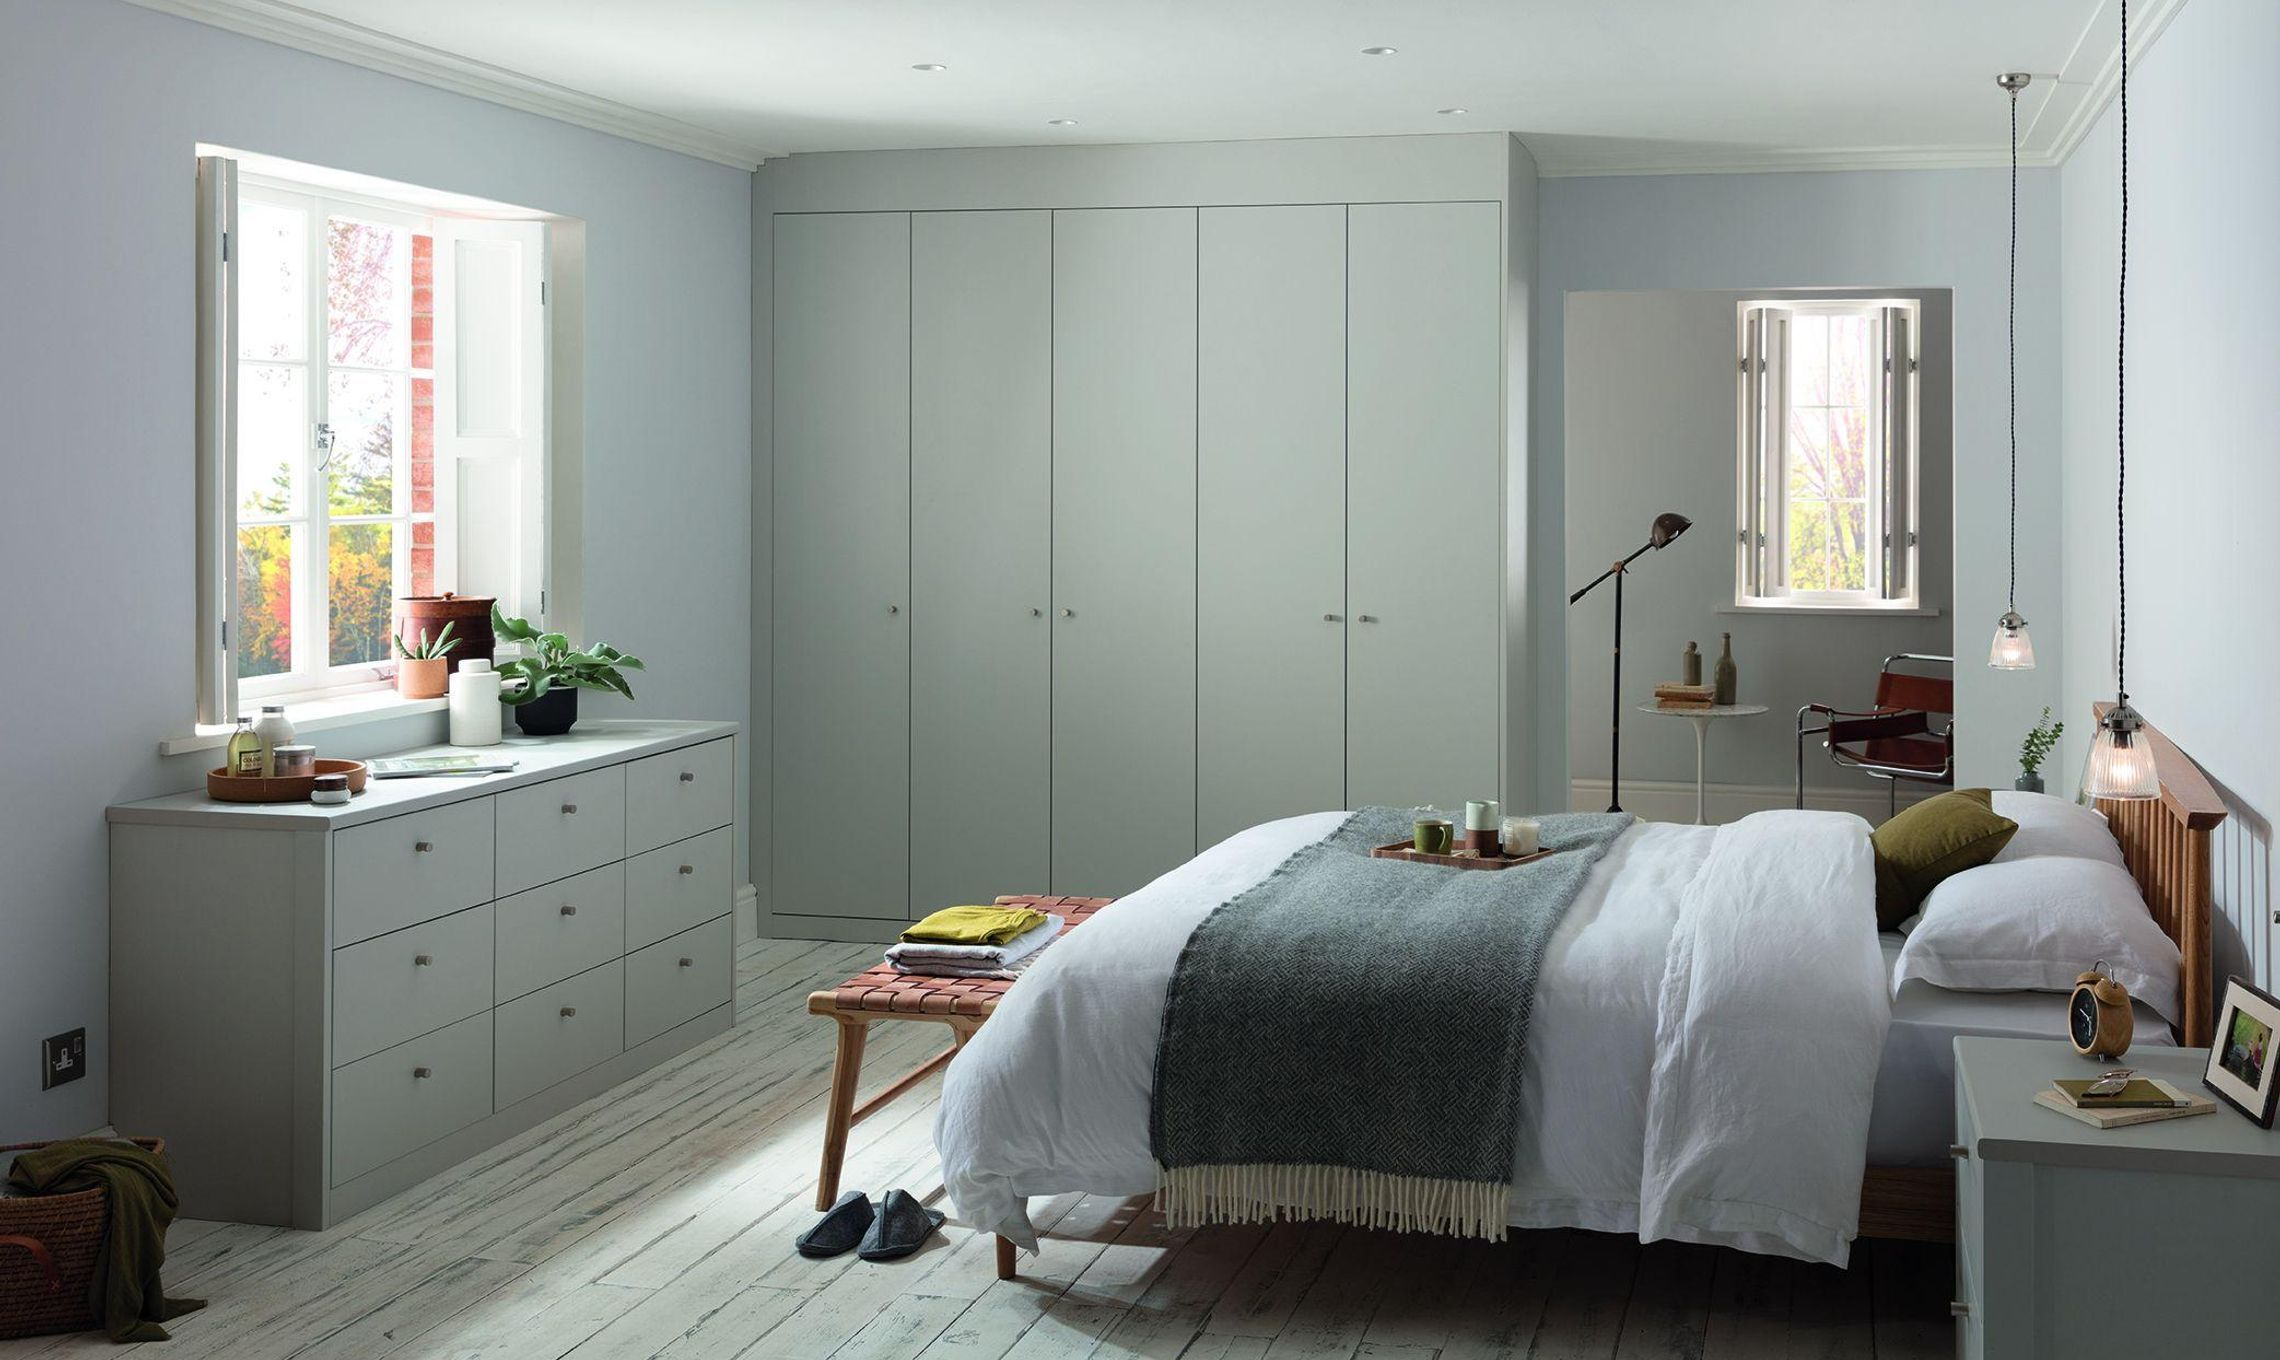 Create The Natural Sleek Look With Hannah Cork Fitted Bedroom Furniture Green Bedroom Design Attic Bedroom Designs